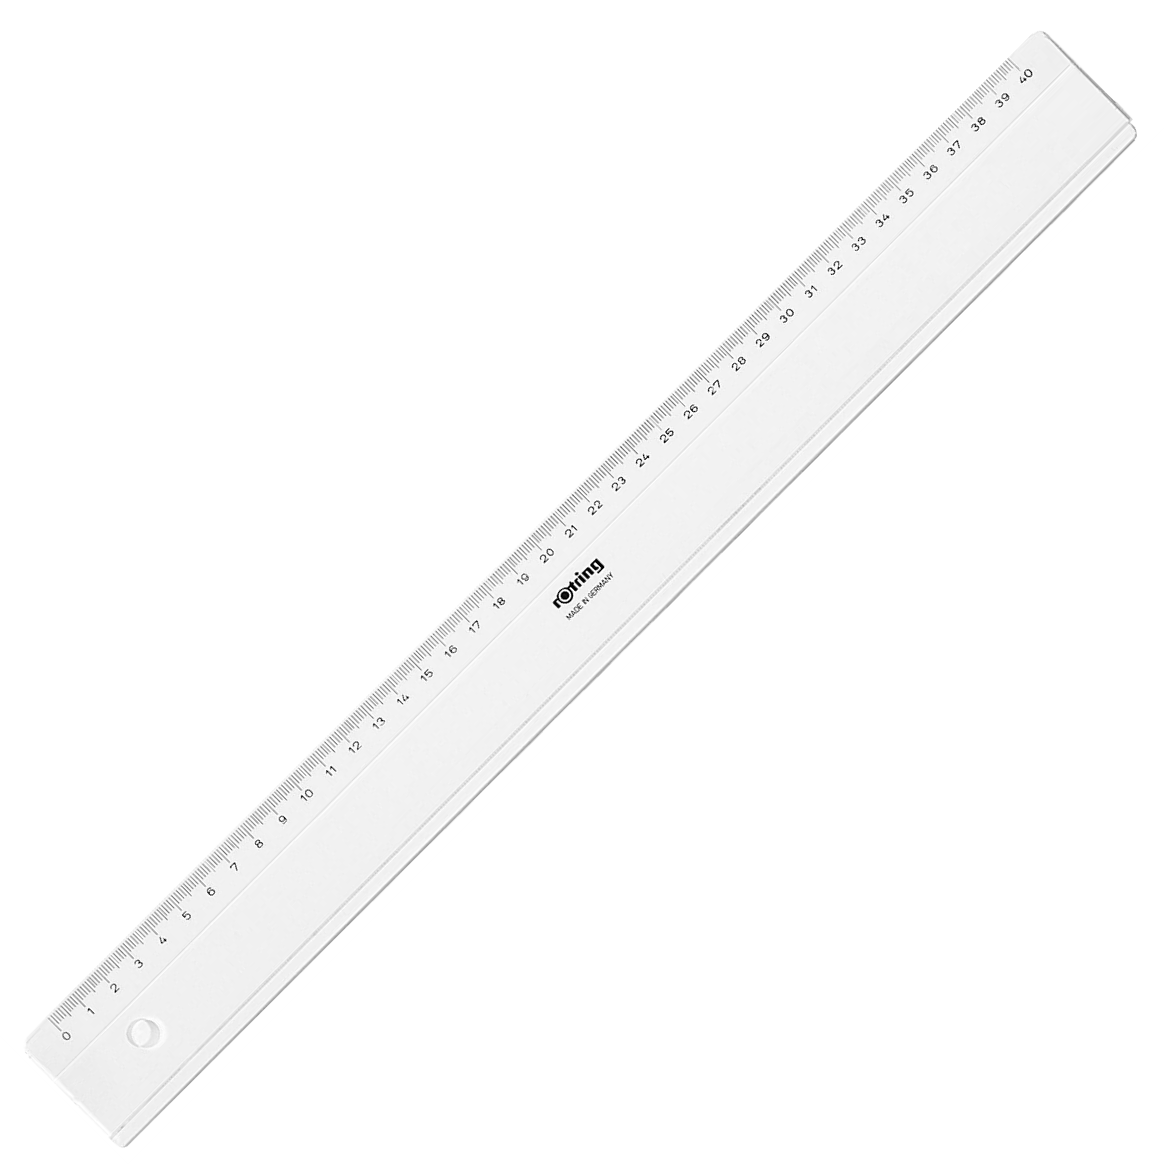 rigla 40cm rotring centro